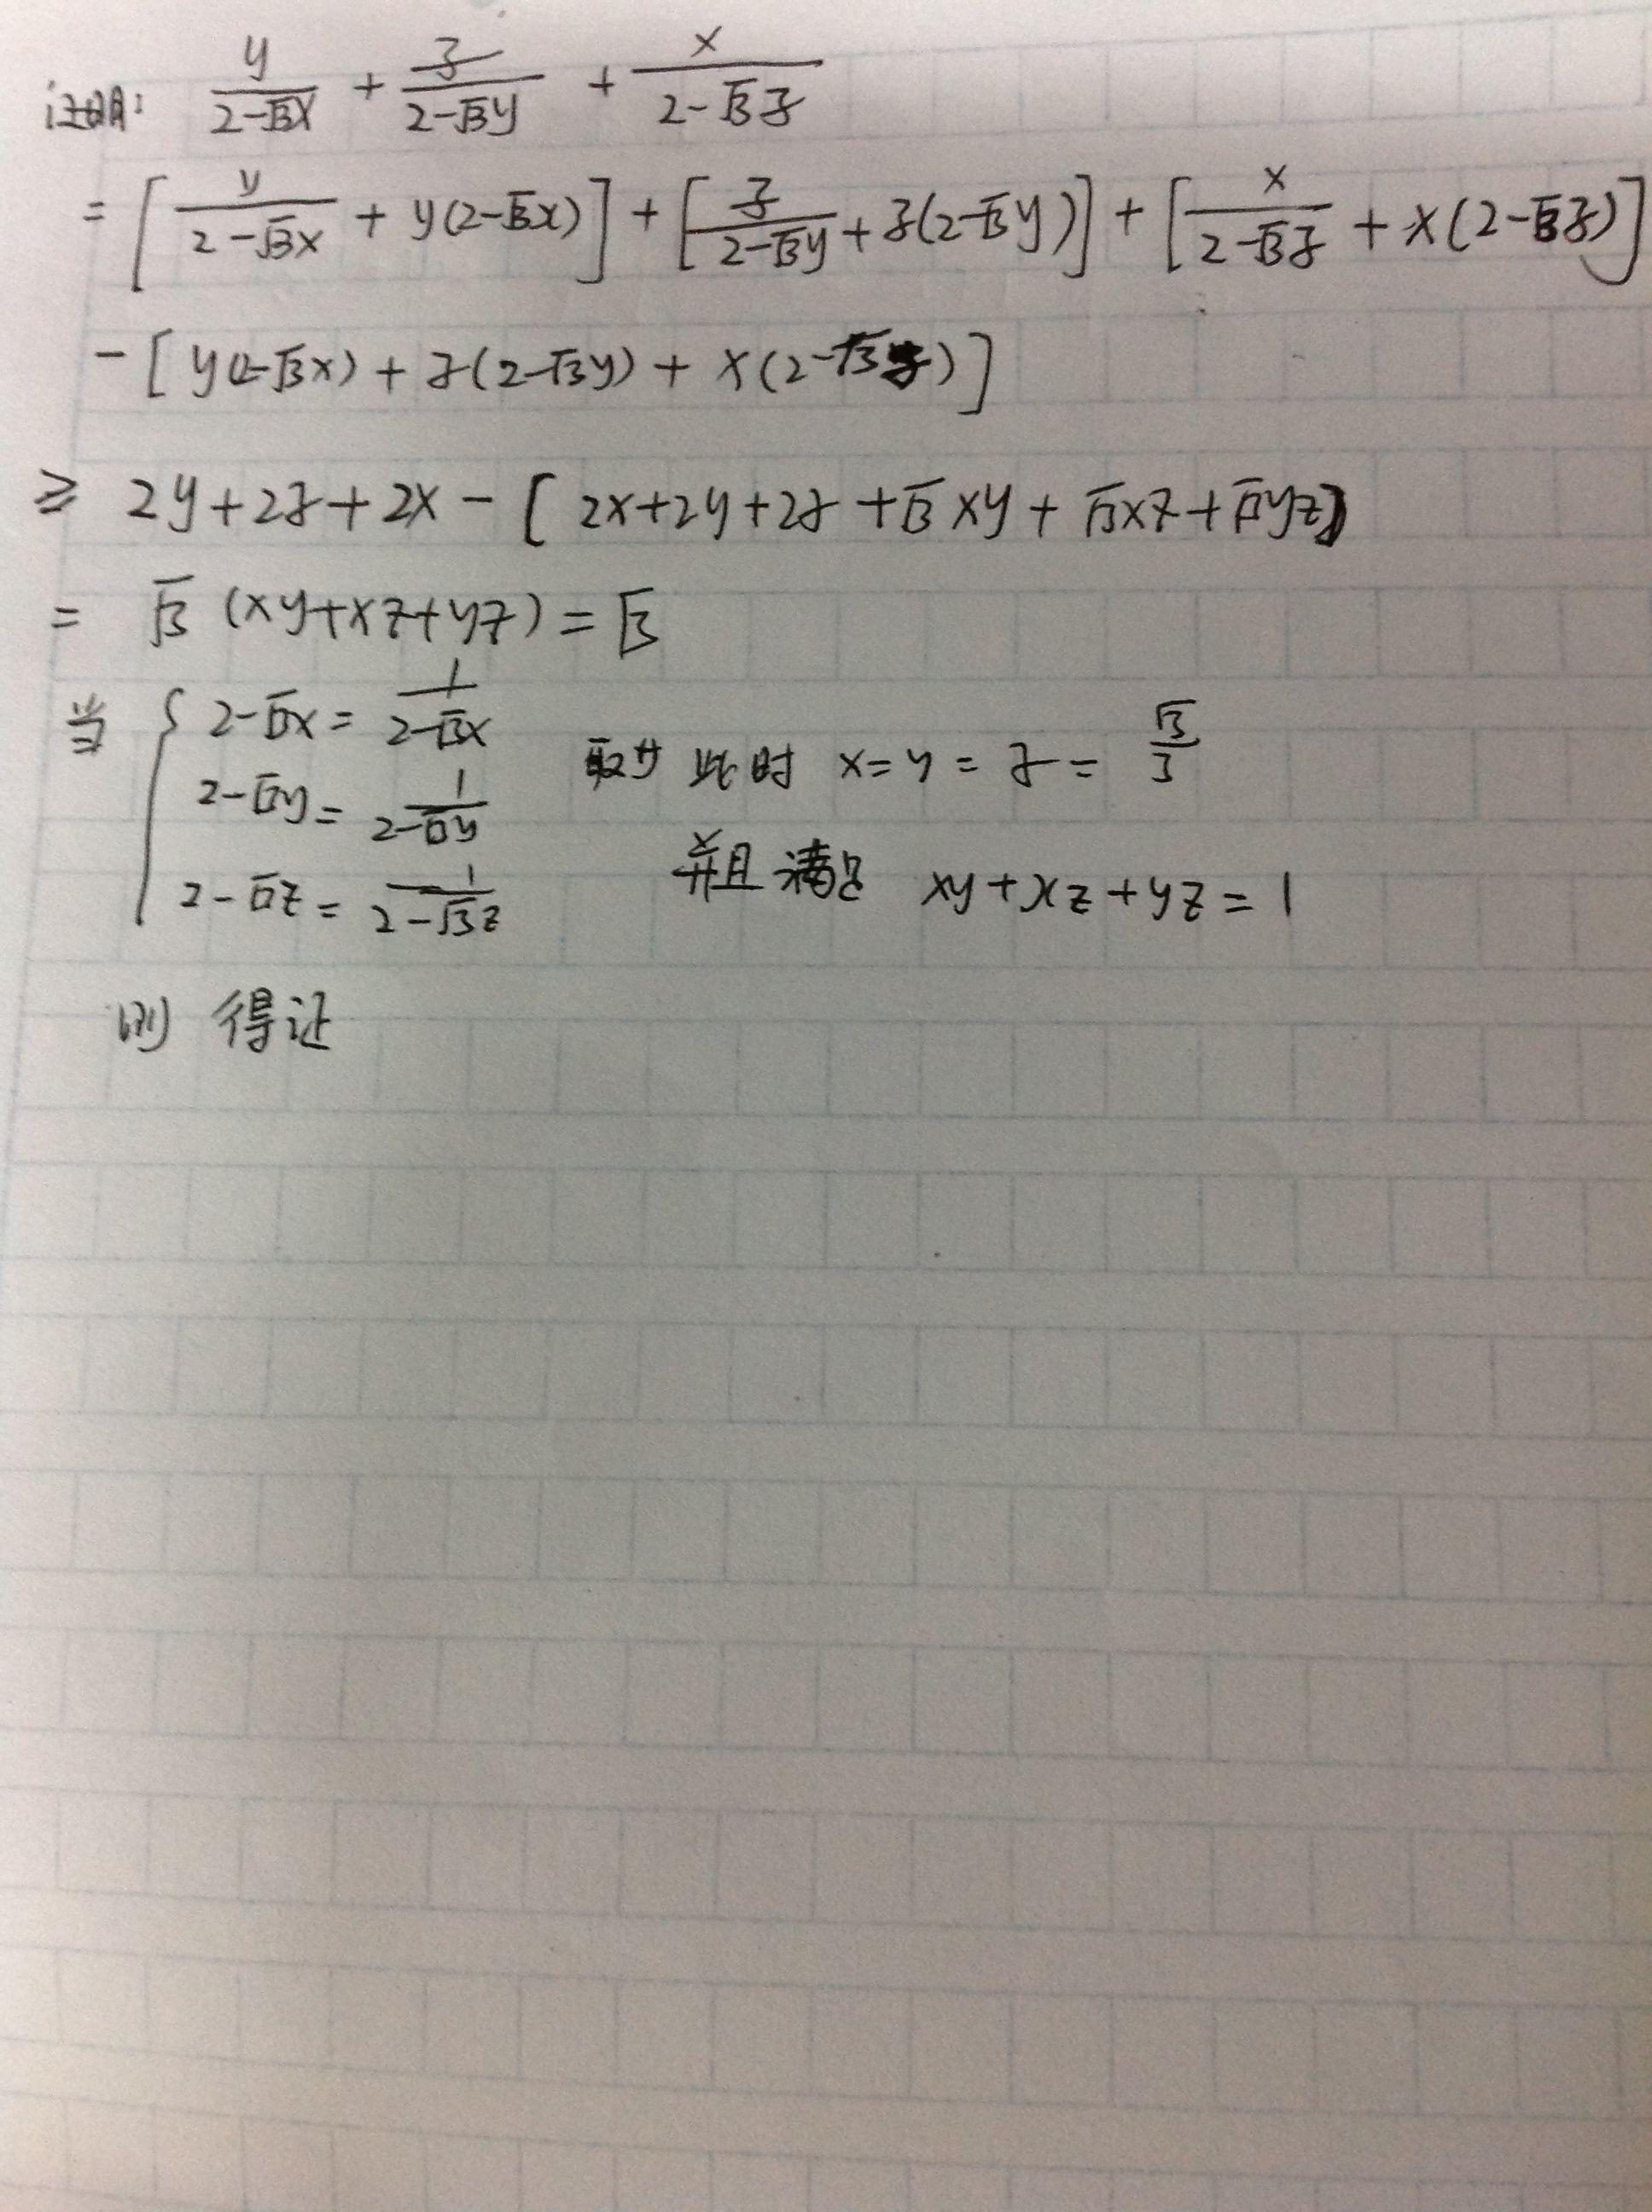 �:--y.#z�y���a�!�_已知x:y:z=2:3::5,求 x-2y+3z 分之x+y的值